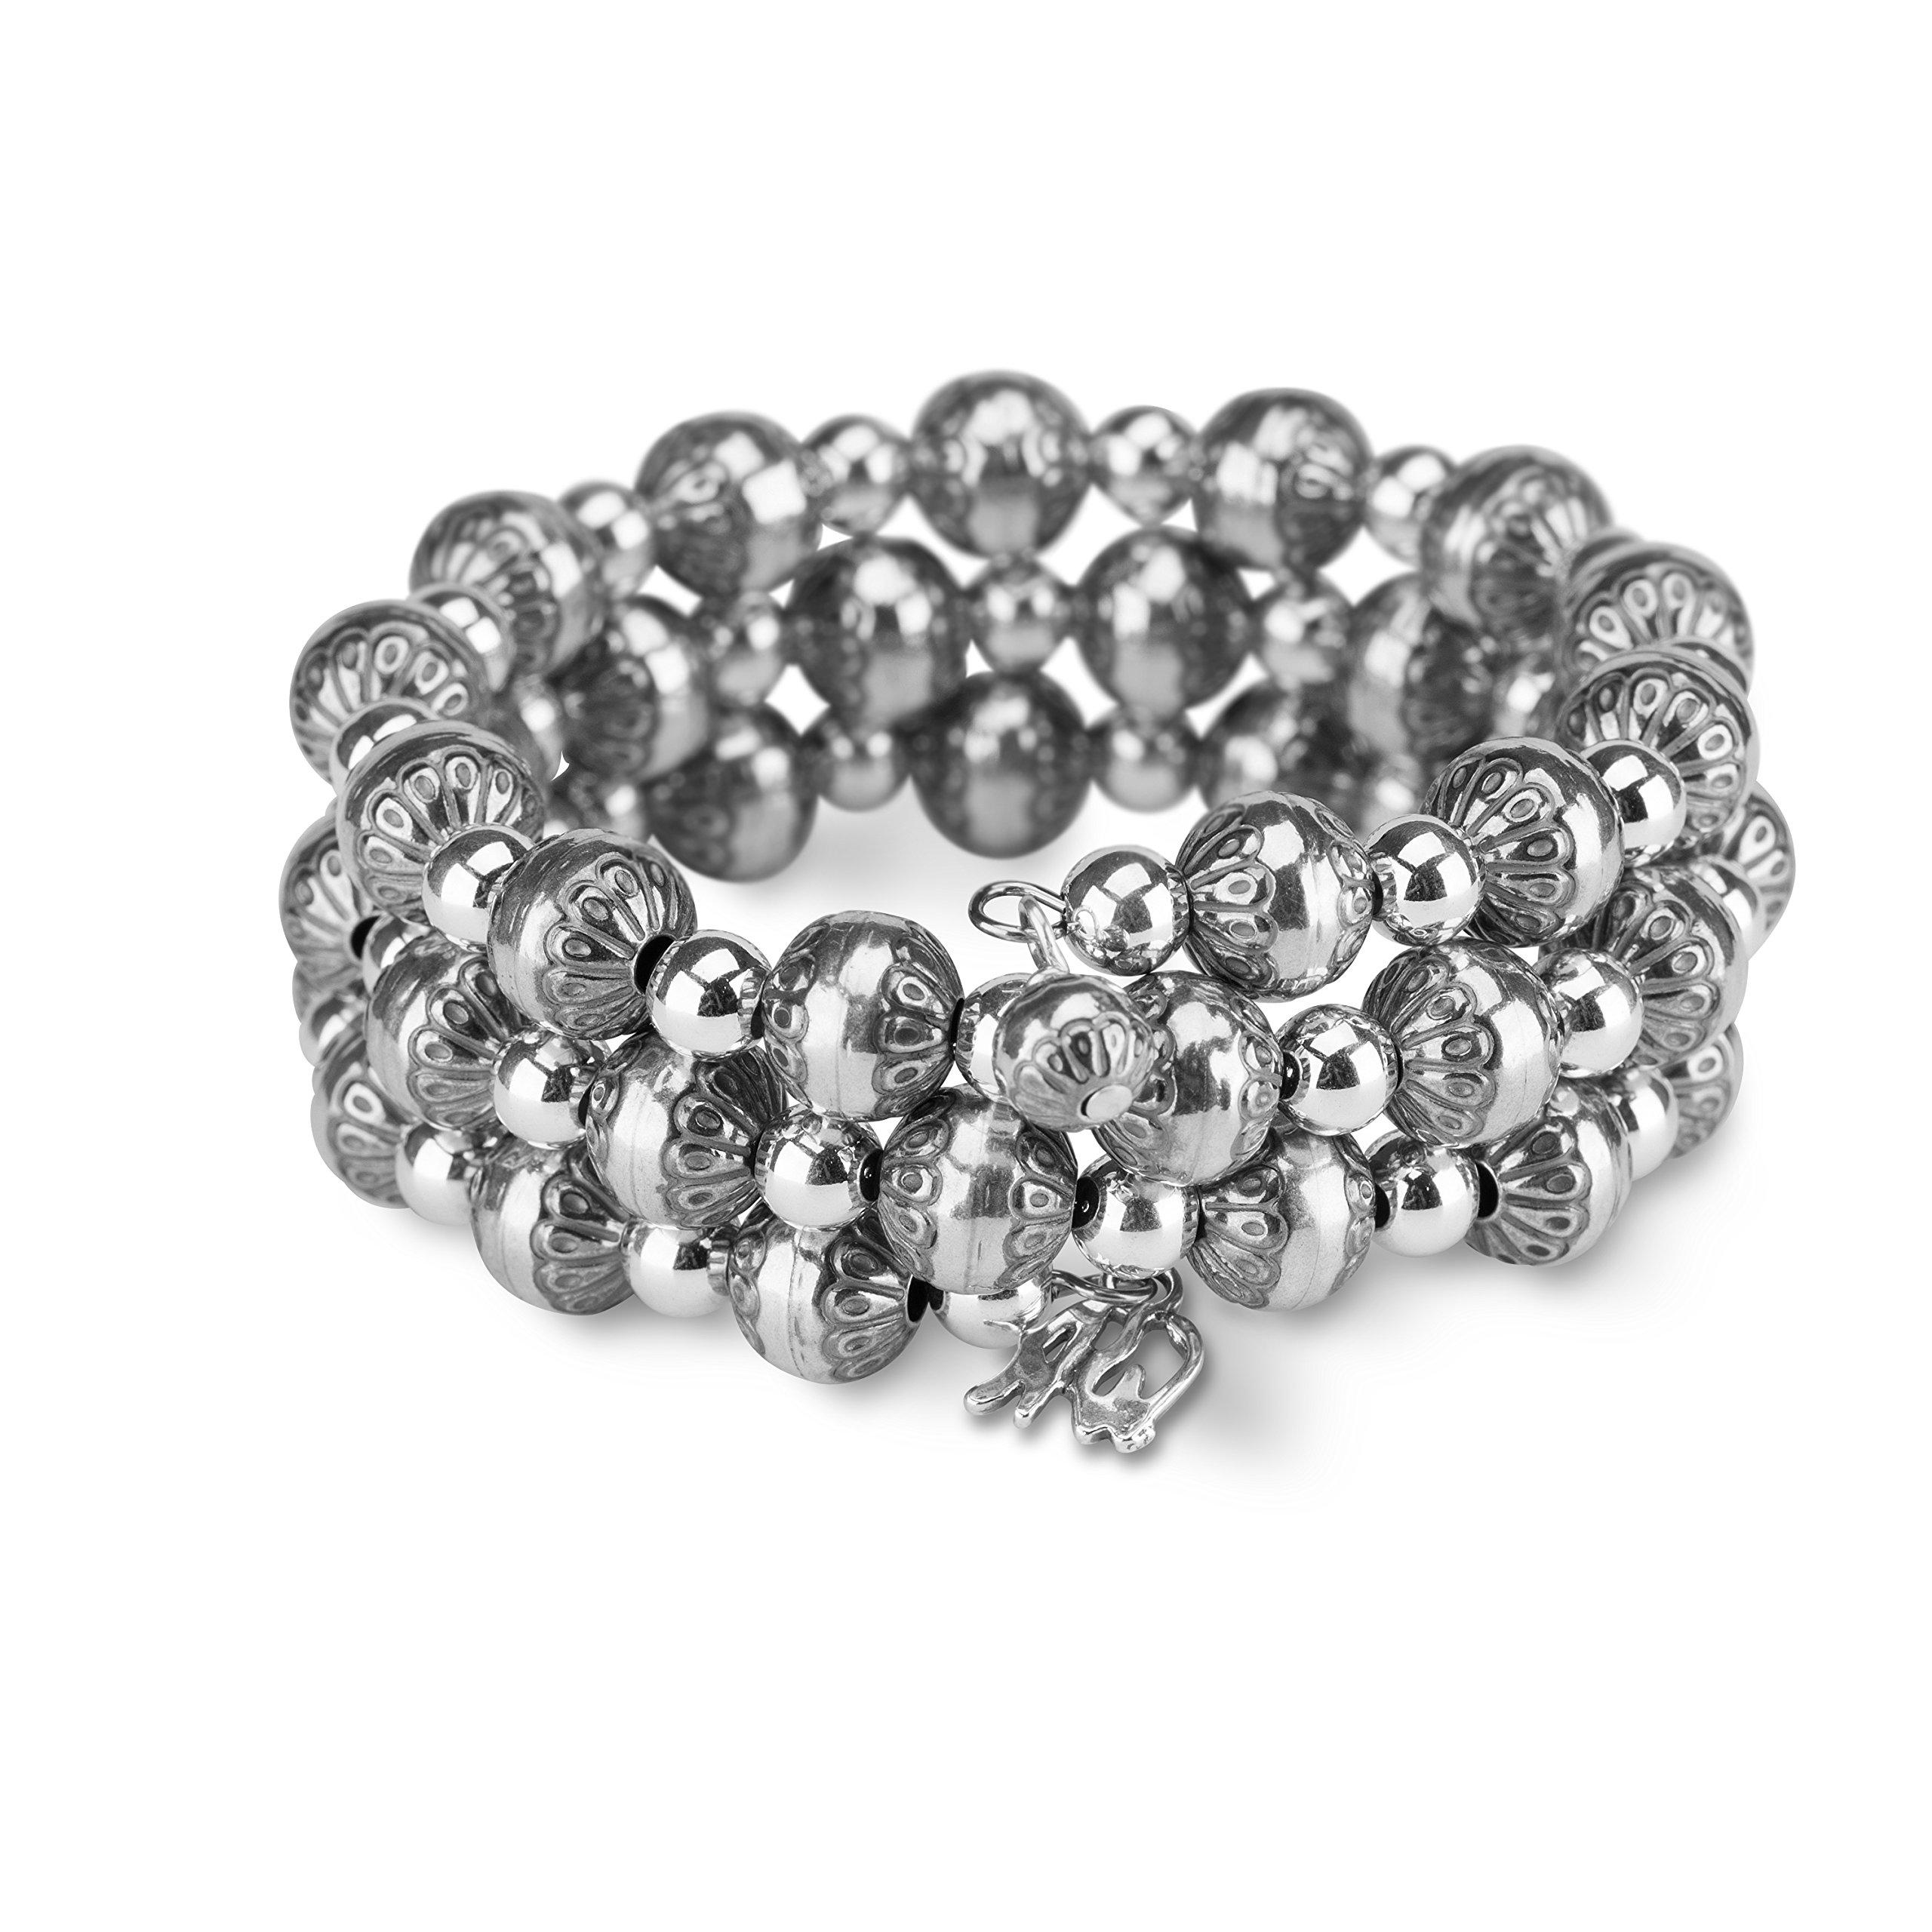 American West Sterling Silver Stamped Polished Beaded Bracelet